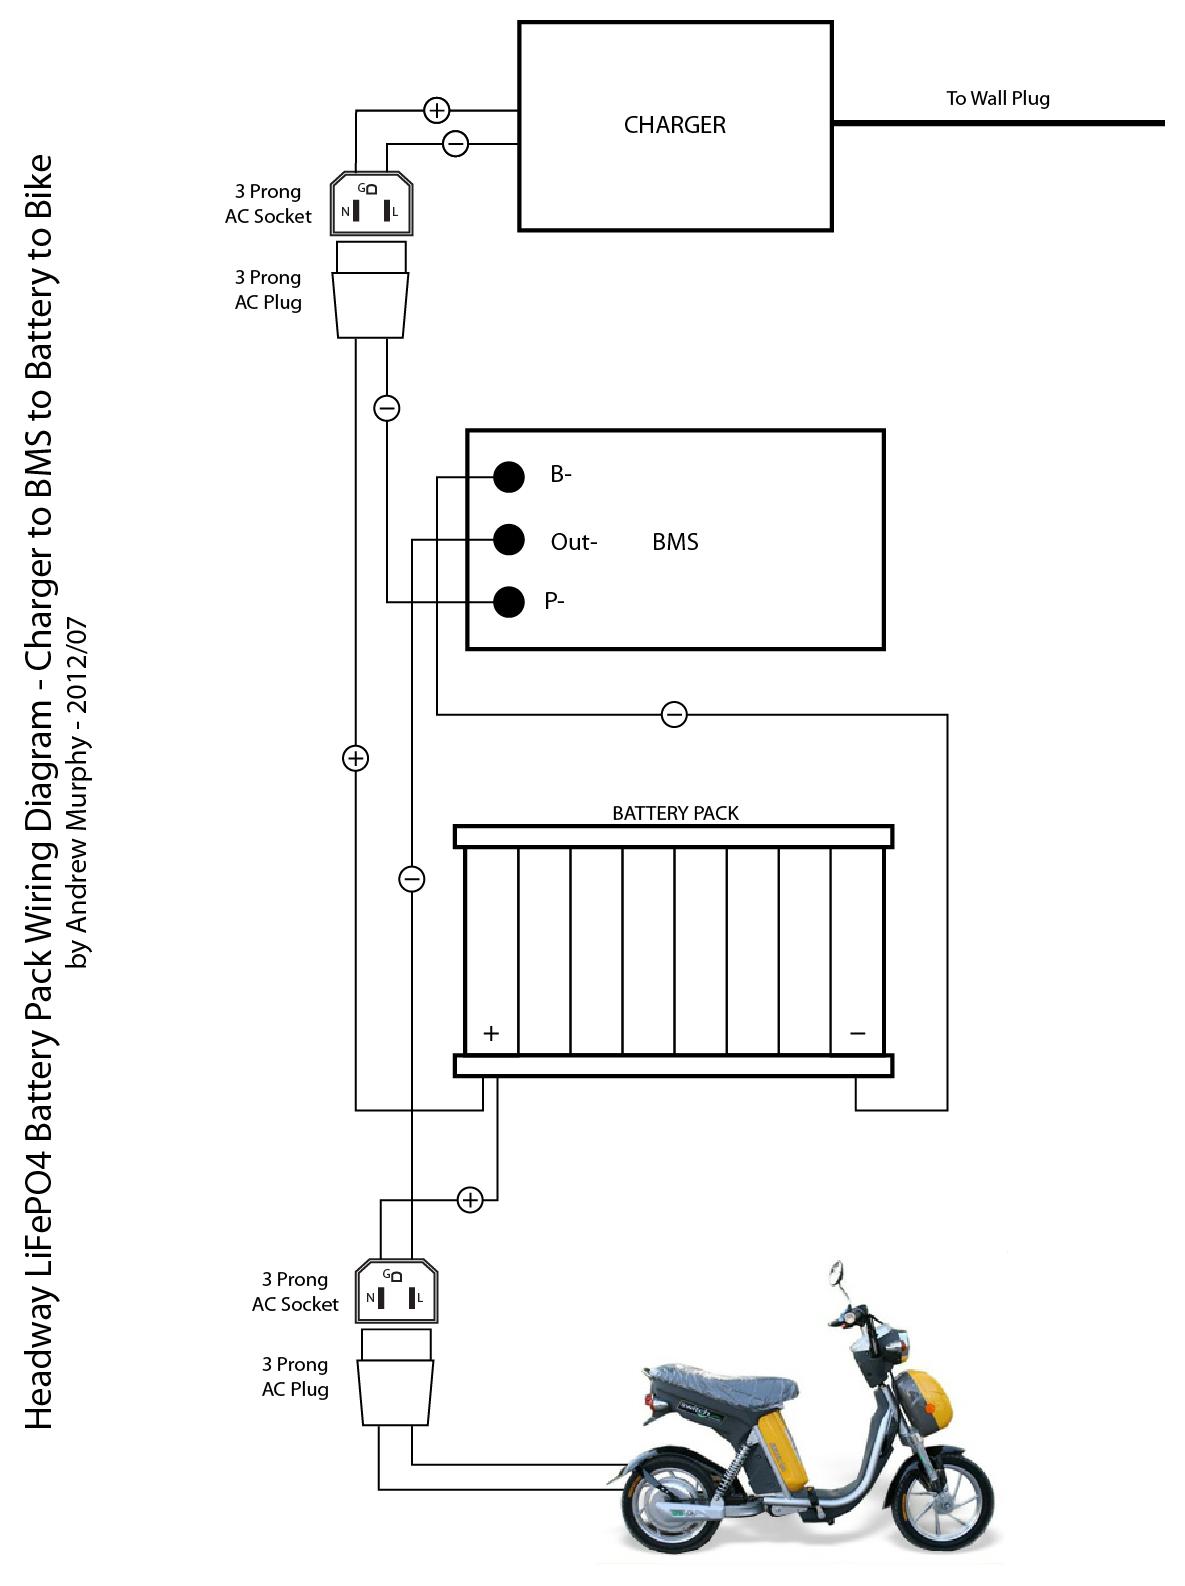 Wiring Diagram Electric Bike Circuit Of Yobike Andr01dmake Ebike Updated Battery Diagrams